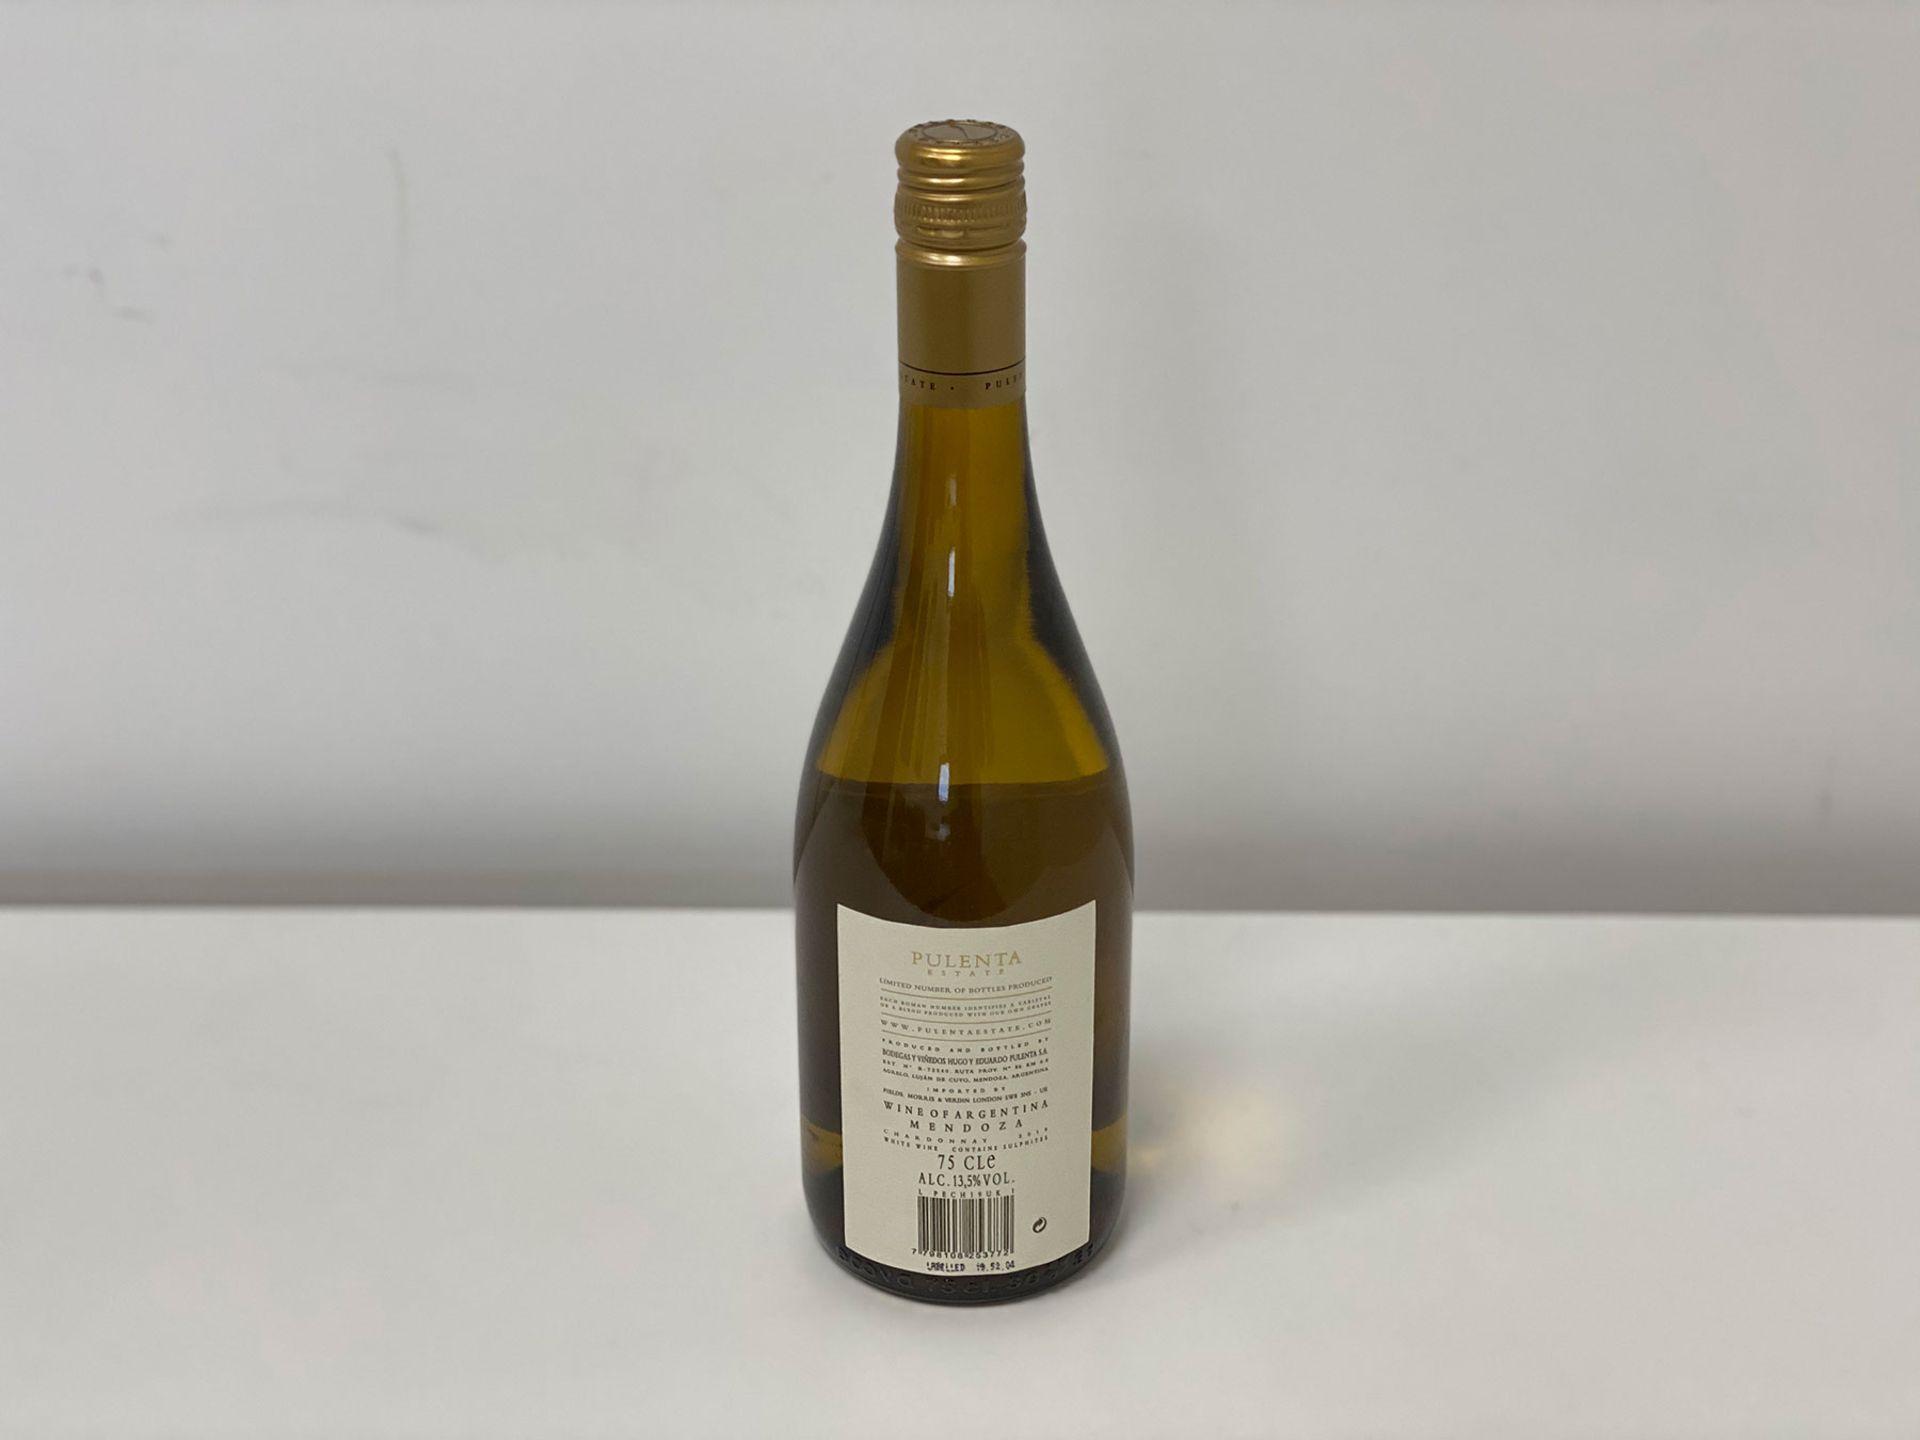 60 Bottles (10 Cases) 2019 Pulenta Estate - Pulenta Estate - Chardonnay - Mendoza - Image 2 of 2